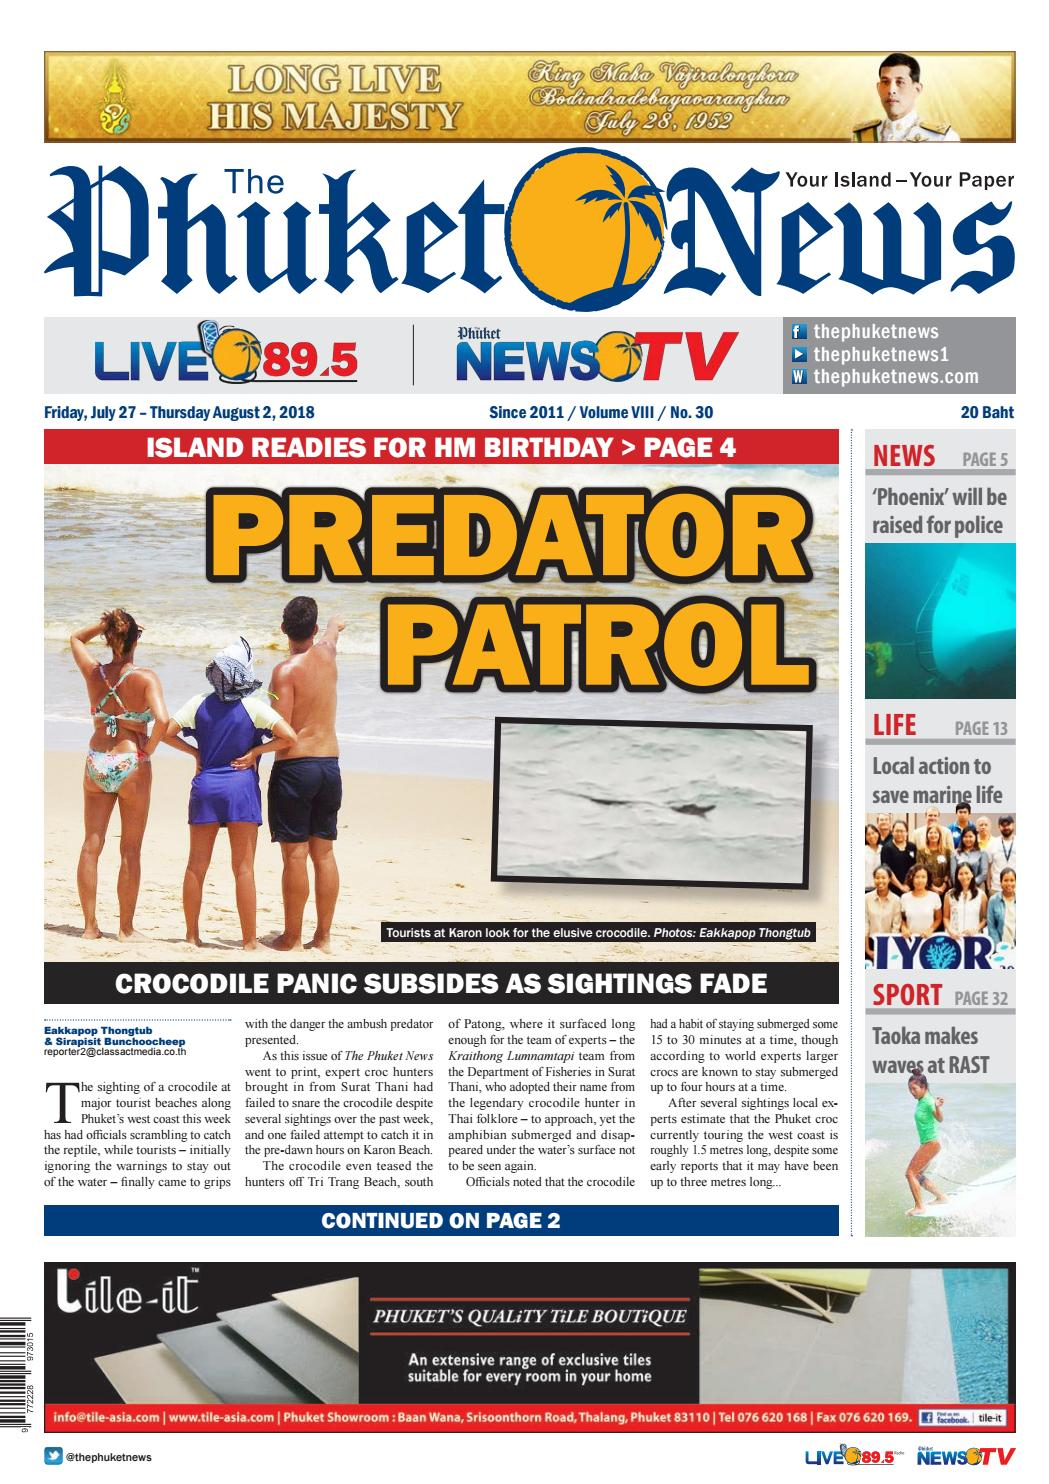 The Phuket News 27 July 2018 by The Phuket News - issuu